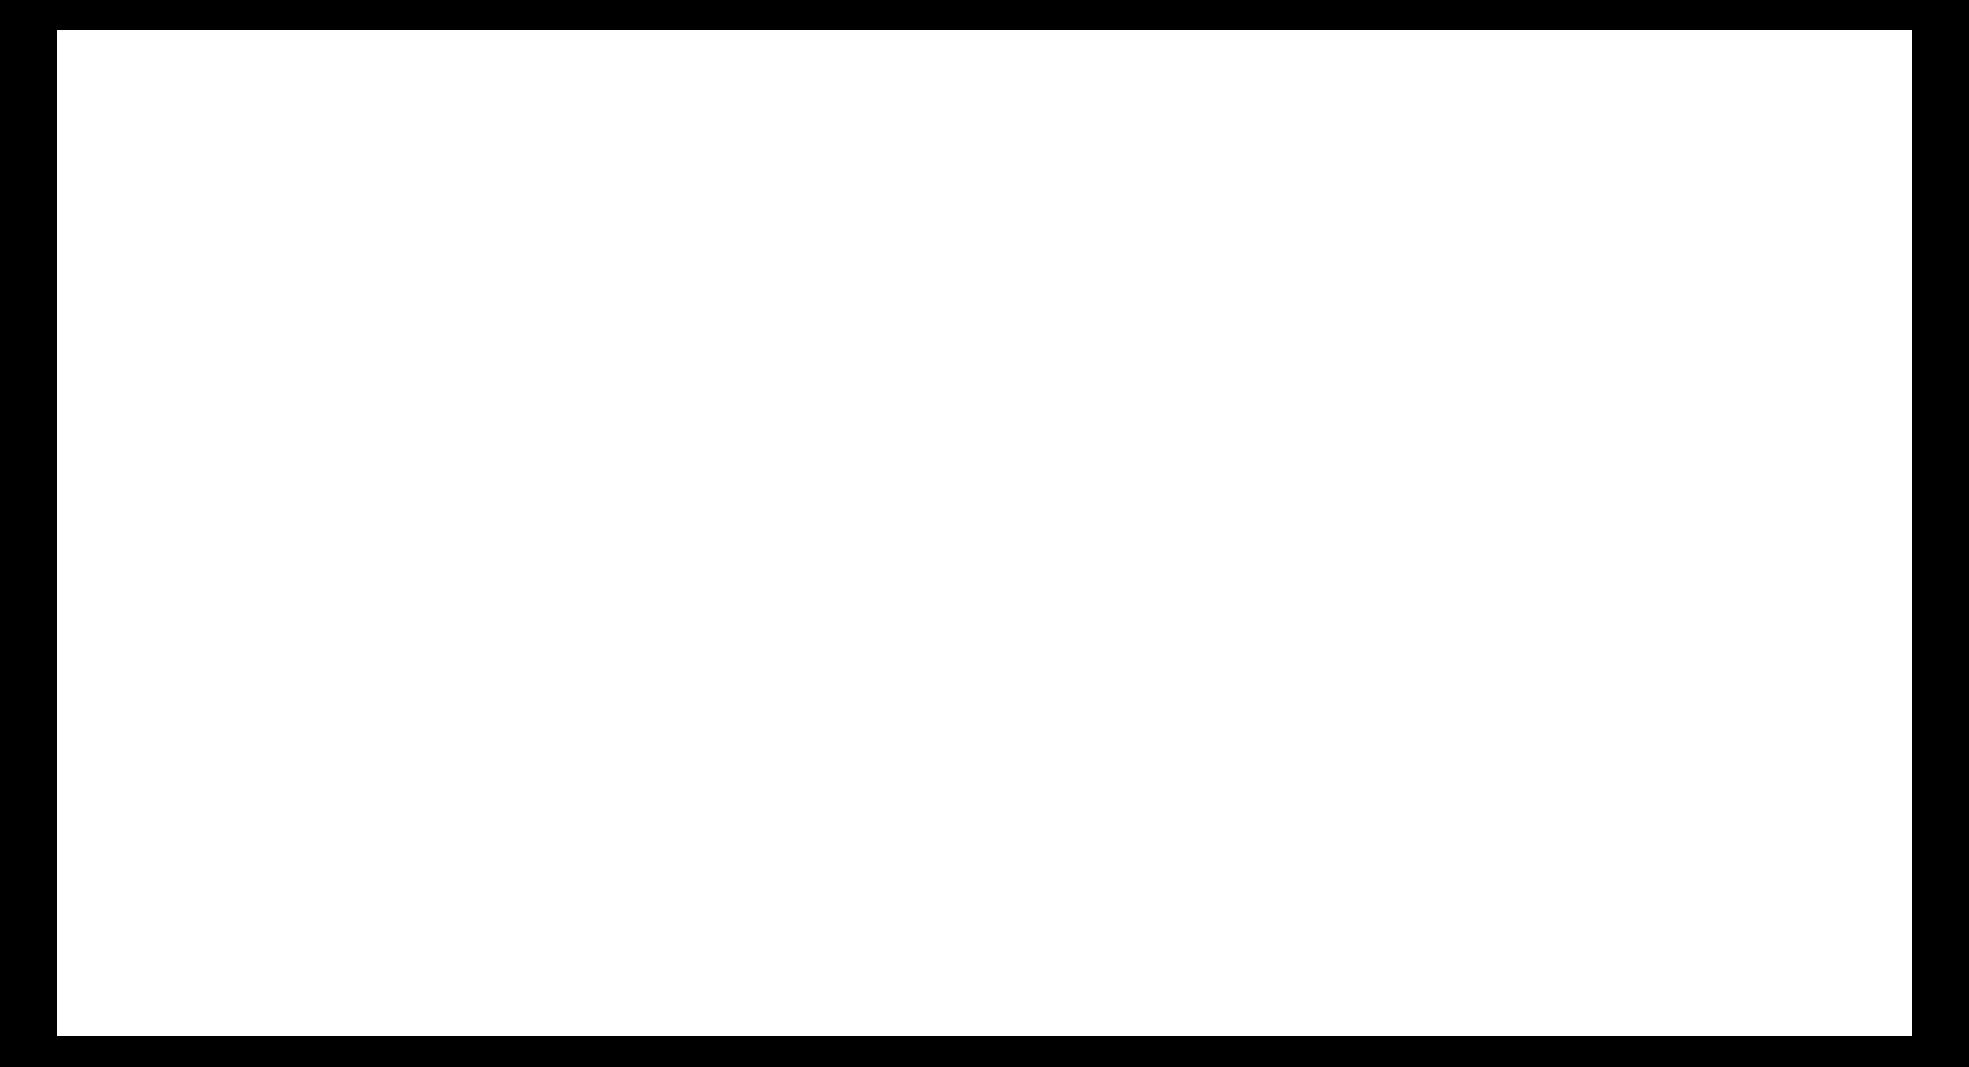 Award_INNY2011.png